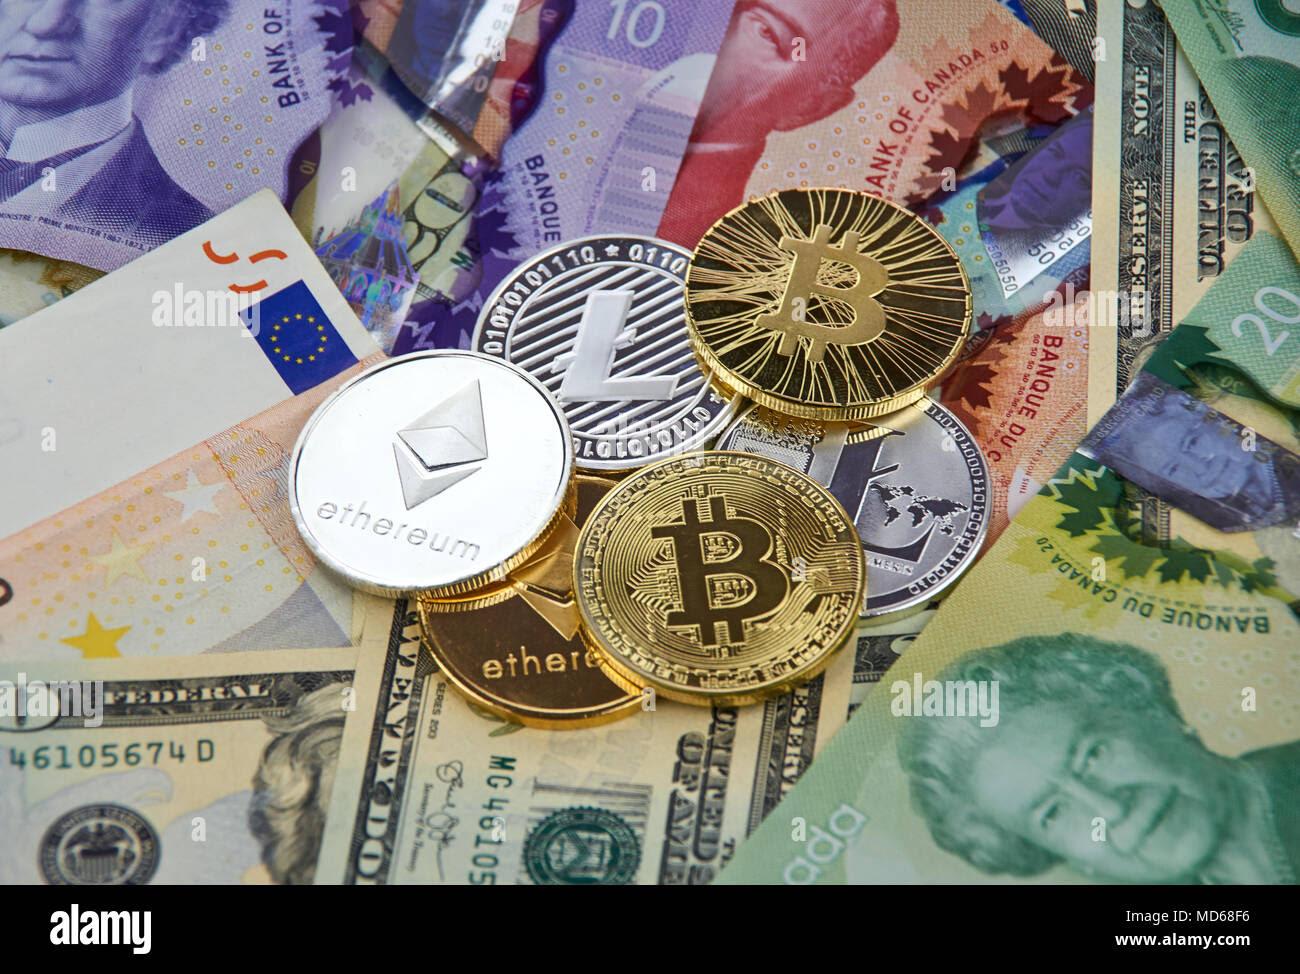 bitcoin account in kenya